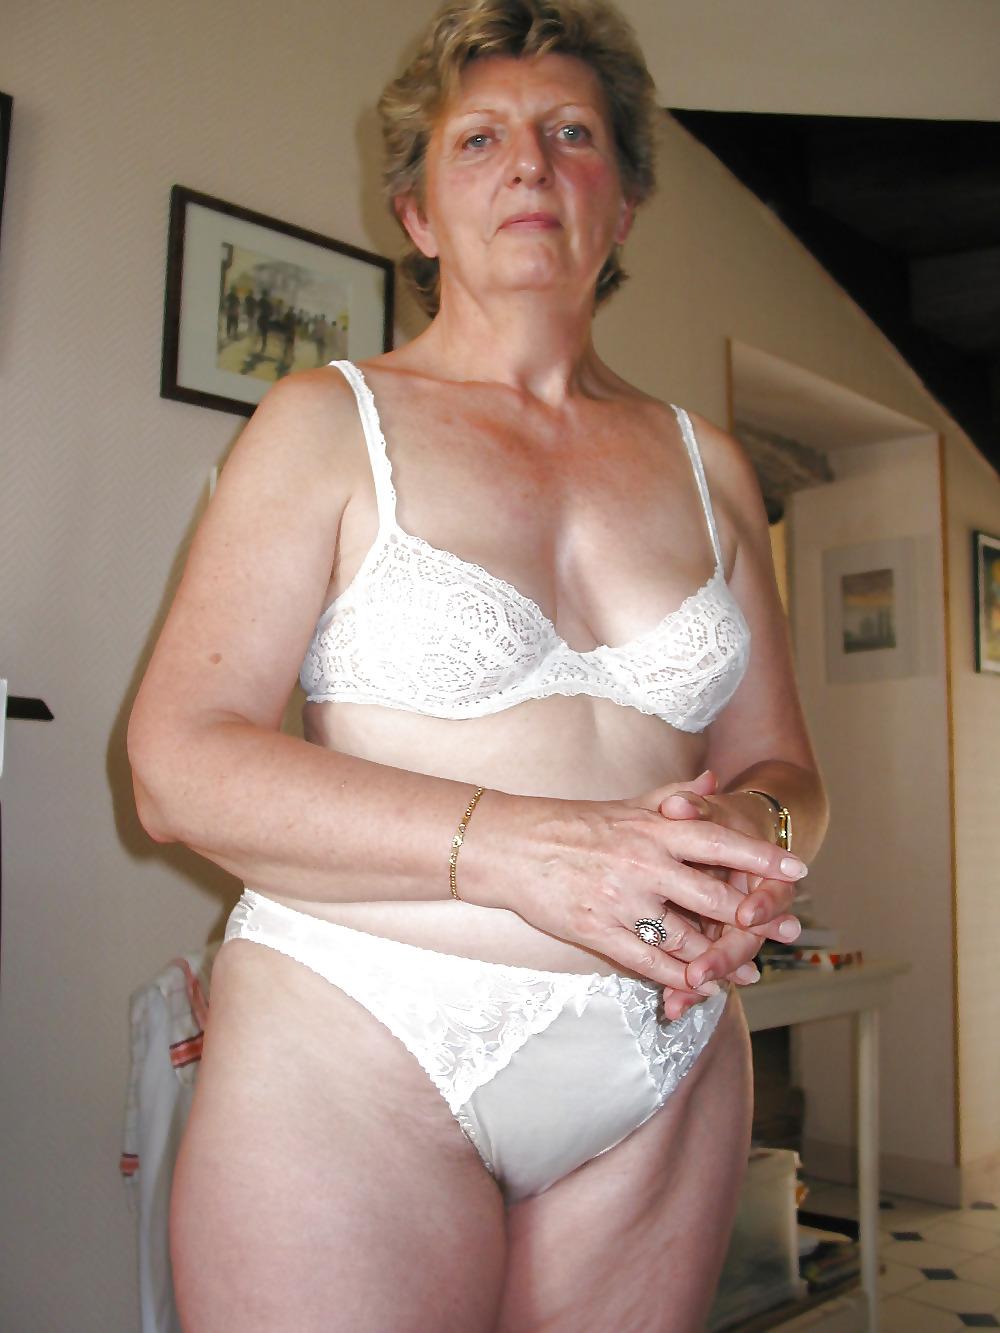 mature-women-underwear-pictures-blode-pics-las